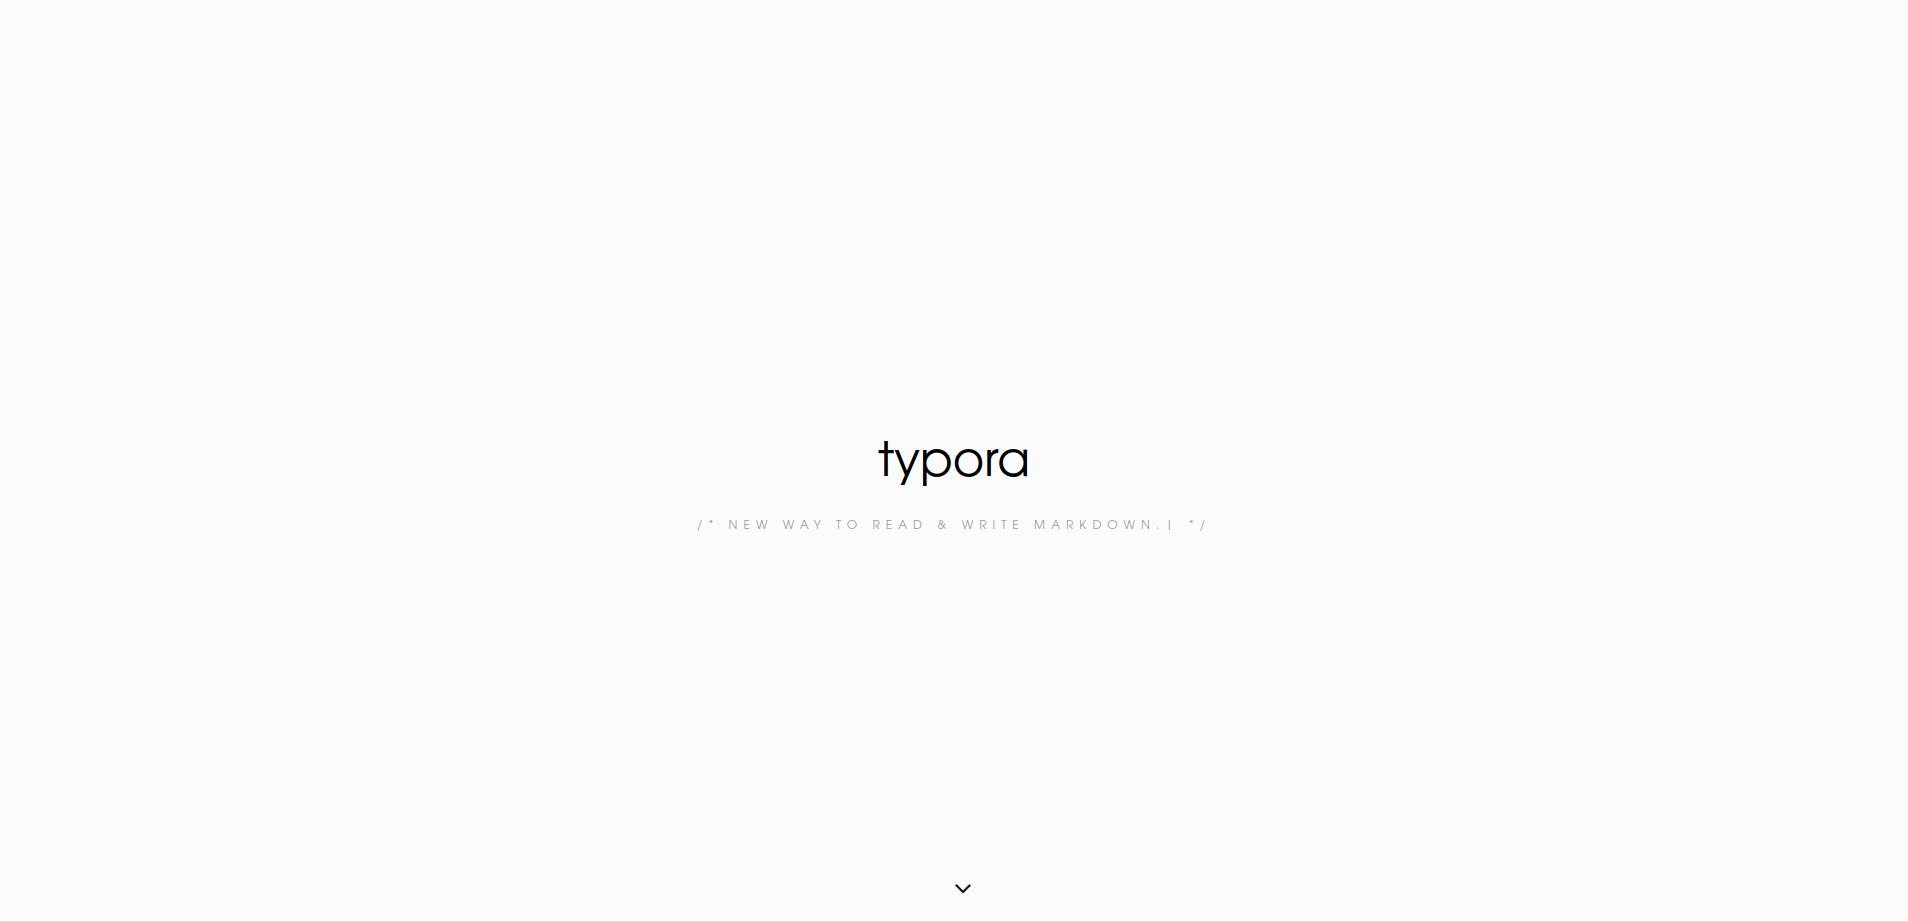 Typora - 好用的 markdown 編輯器